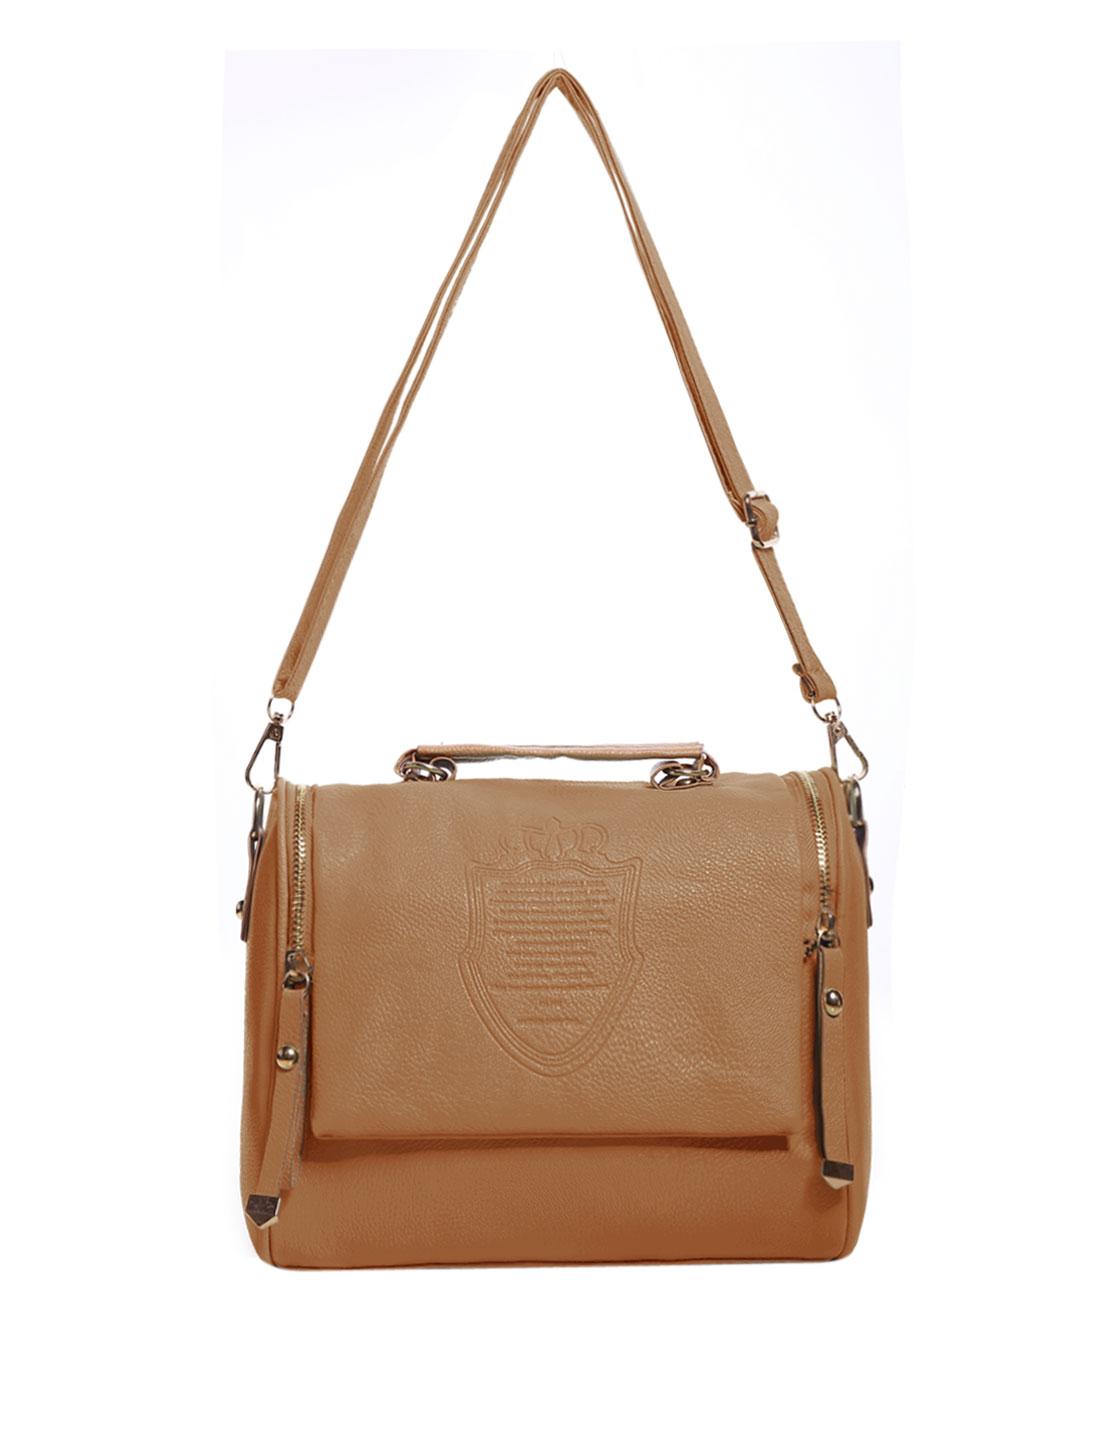 Retro Imperial Crown Pattern Faux Leather Women Handbag Tote Messenger Shoulder Bag Khaki